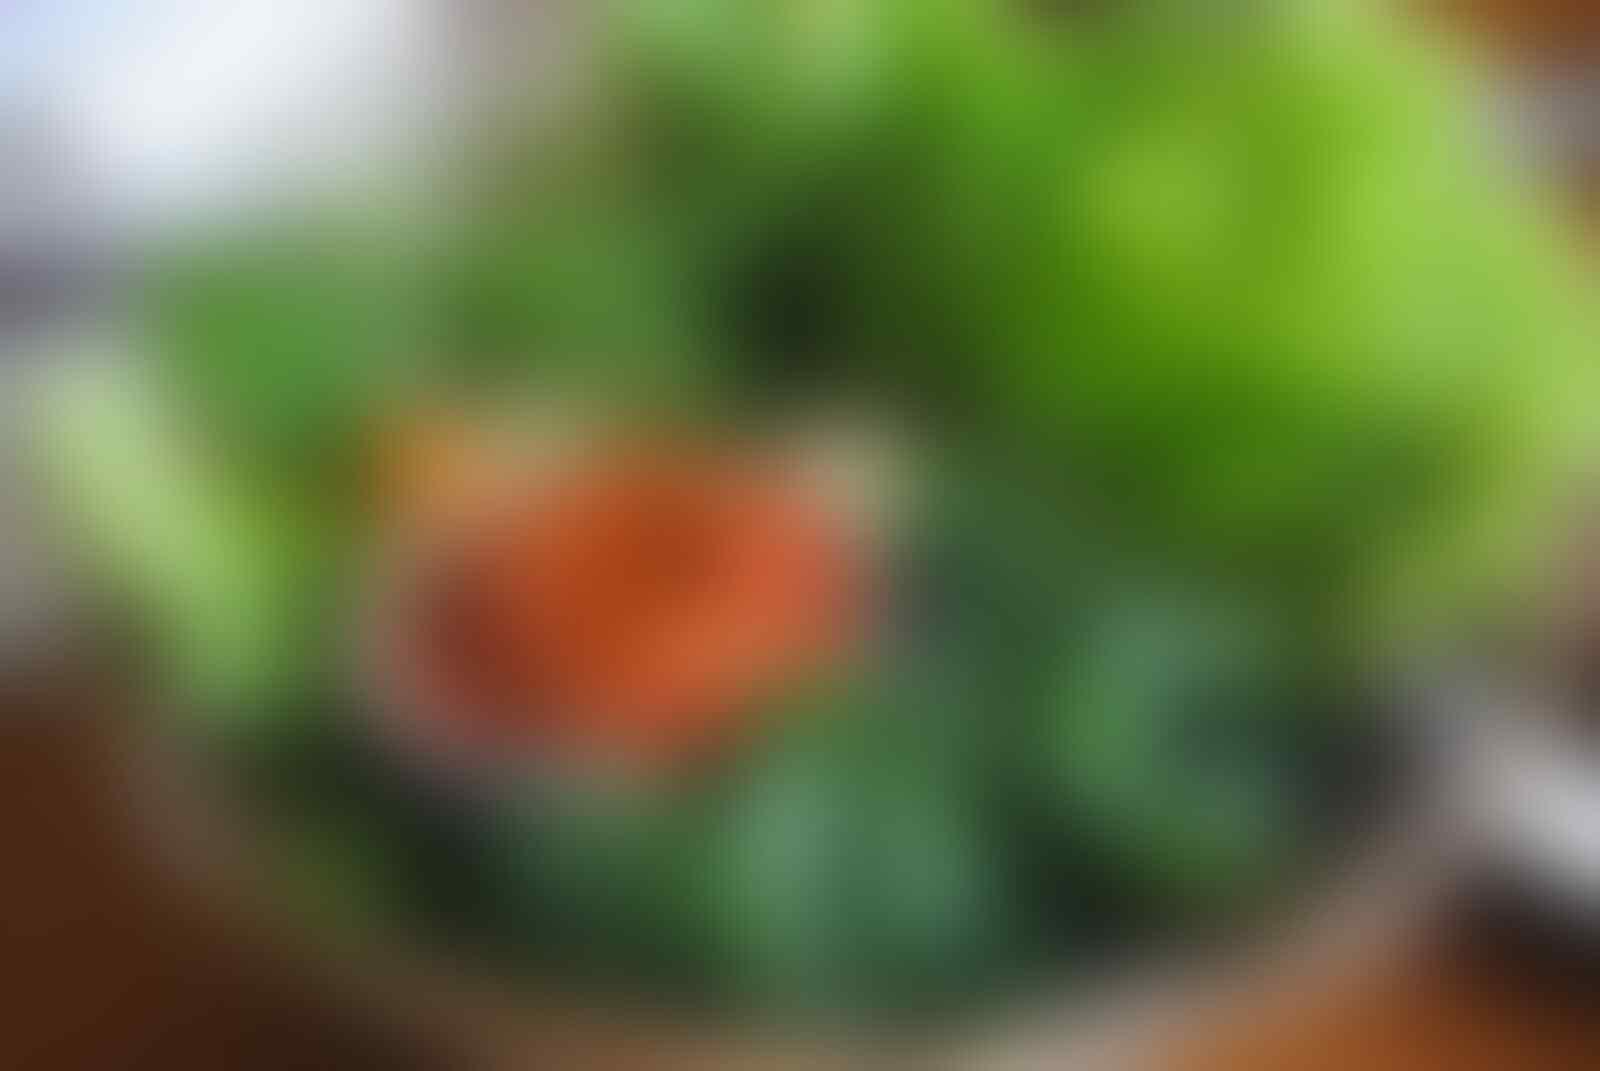 7 Makanan Ini Cocoknya Dengan Sambel Setan, Bikin Kamu Lupa Diet Lho